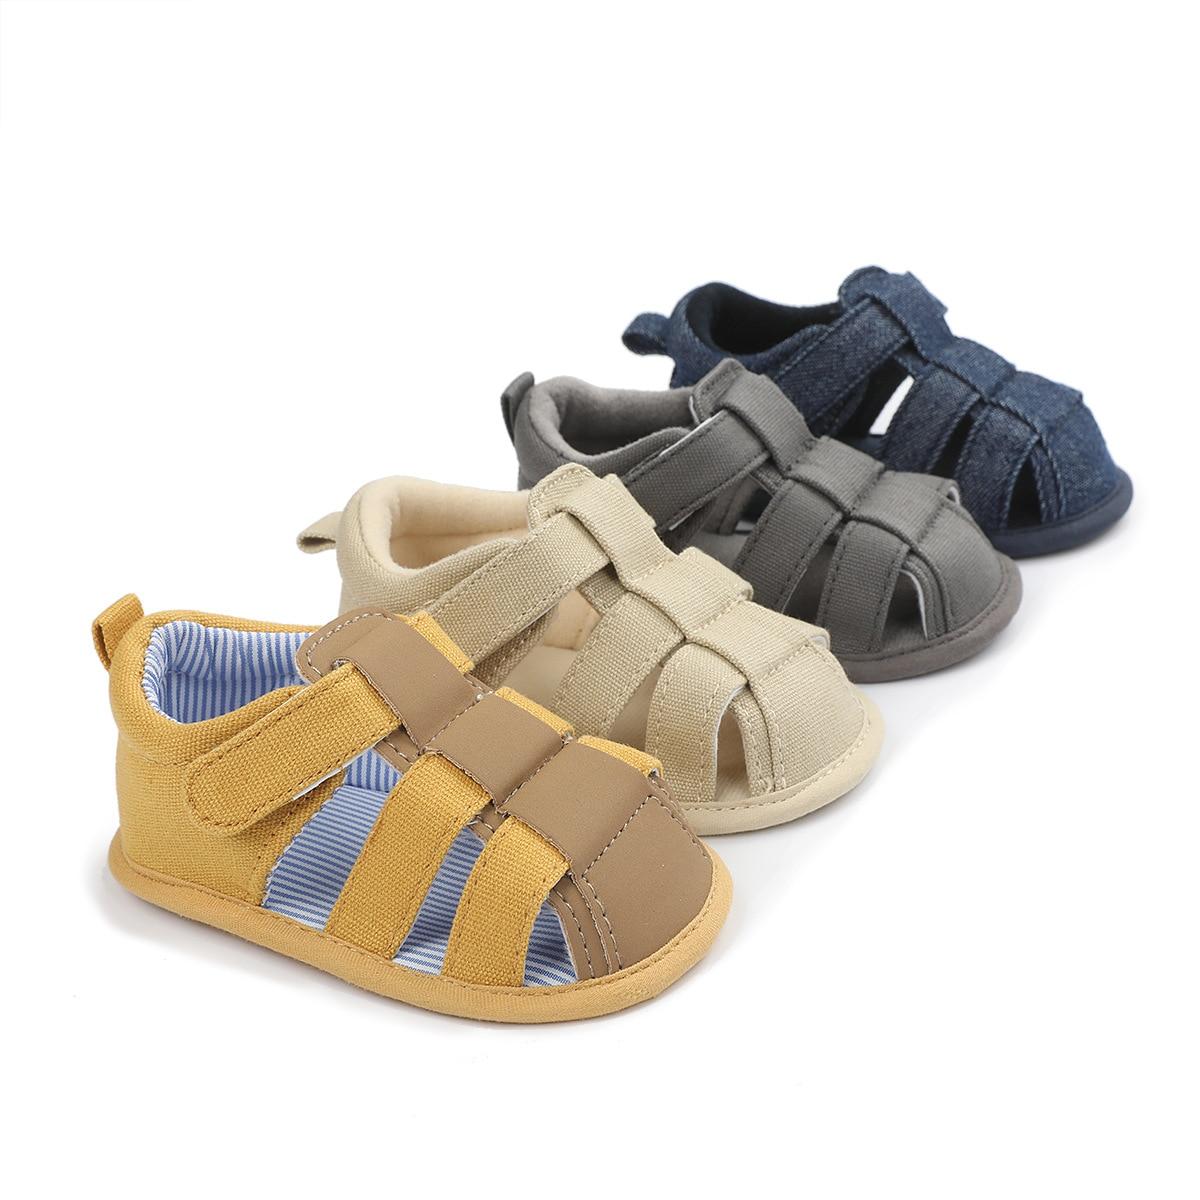 Fashion Products Summer Sandals Newborn Infant Baby Boy Shoes Canvas Sandals Soft Bottom Non-Slip Ba